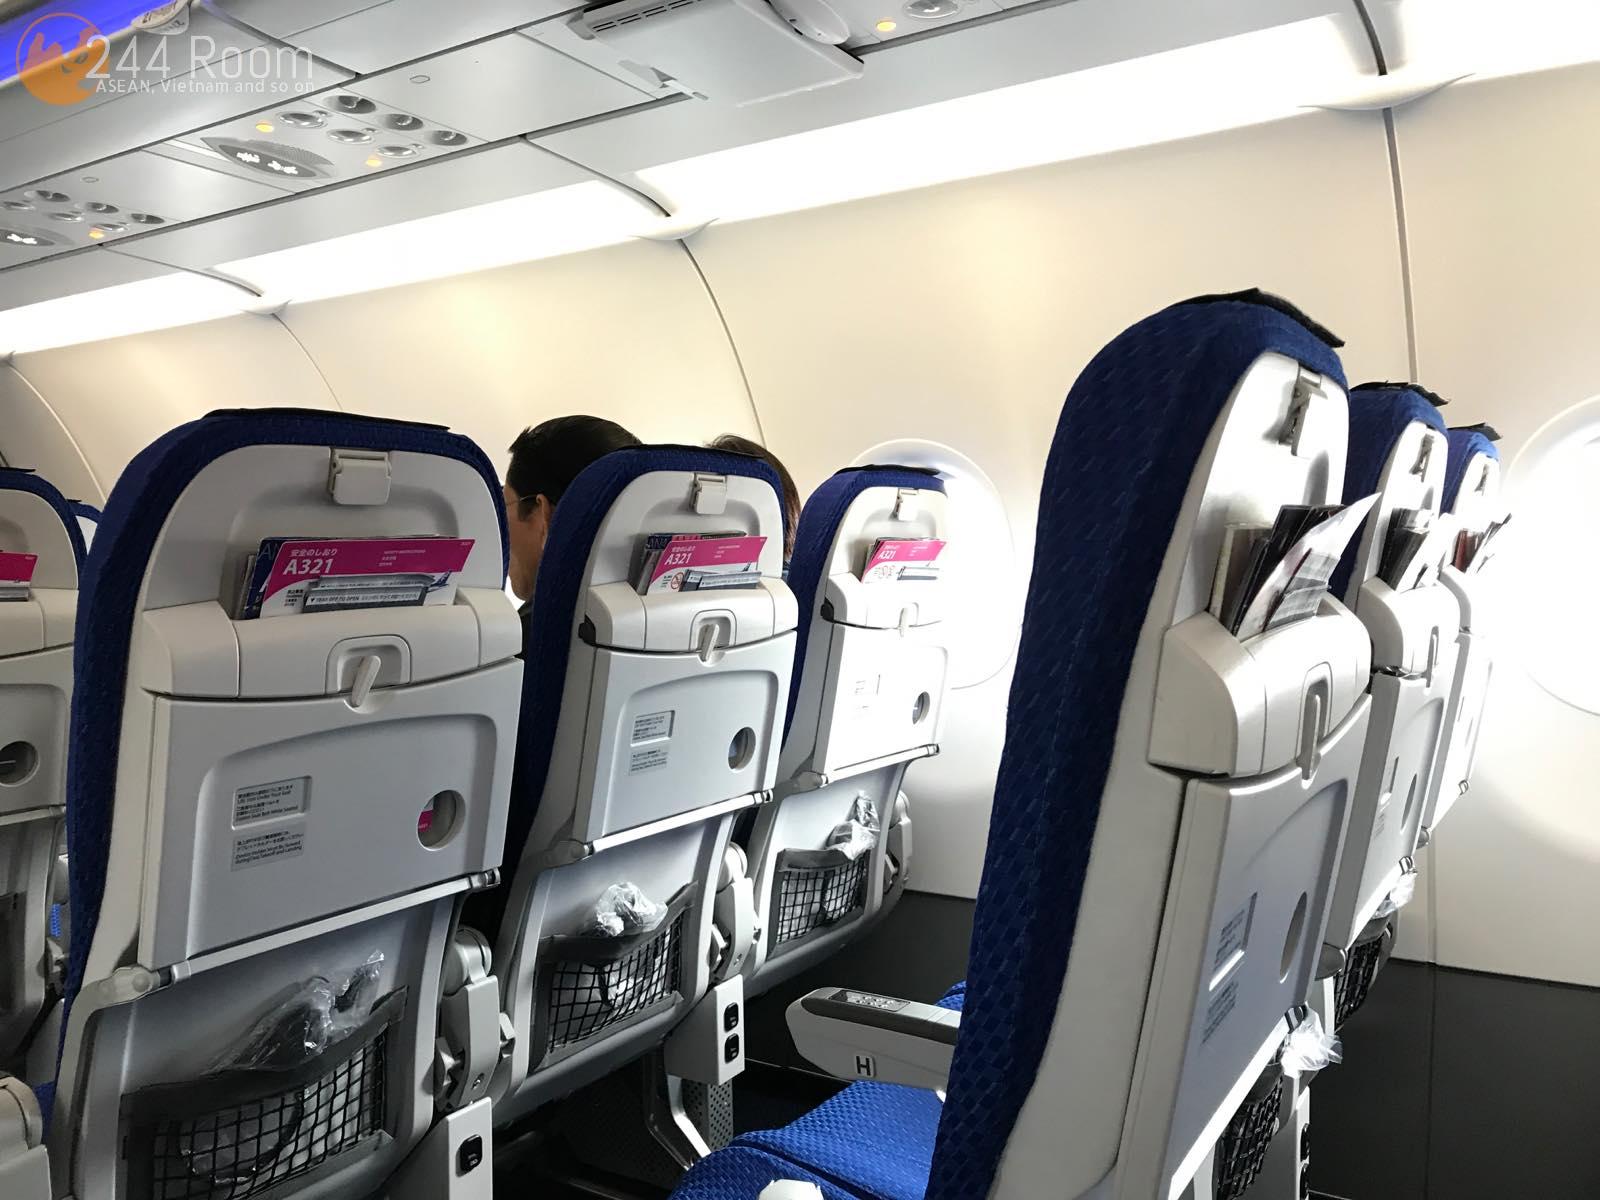 Flight ANA573-A321座席 Seat